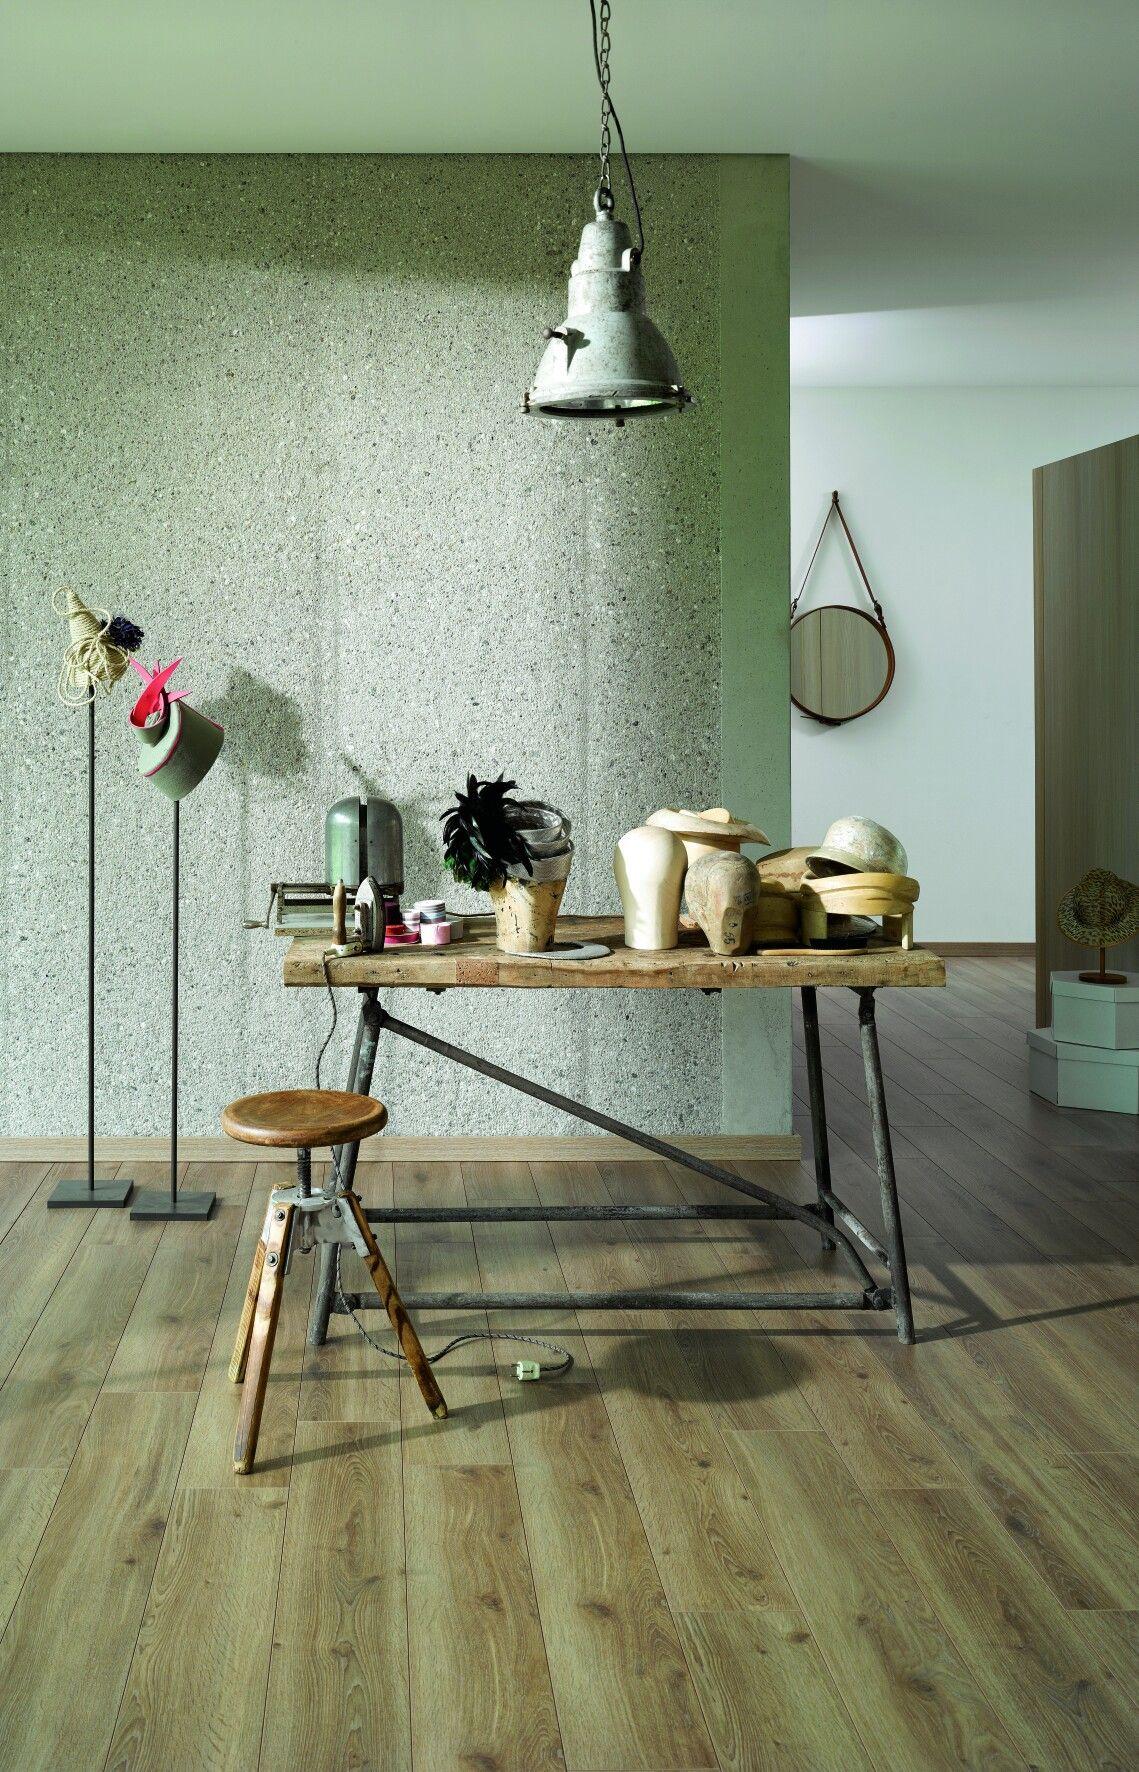 Range Classic (With images) Home decor, Interior design